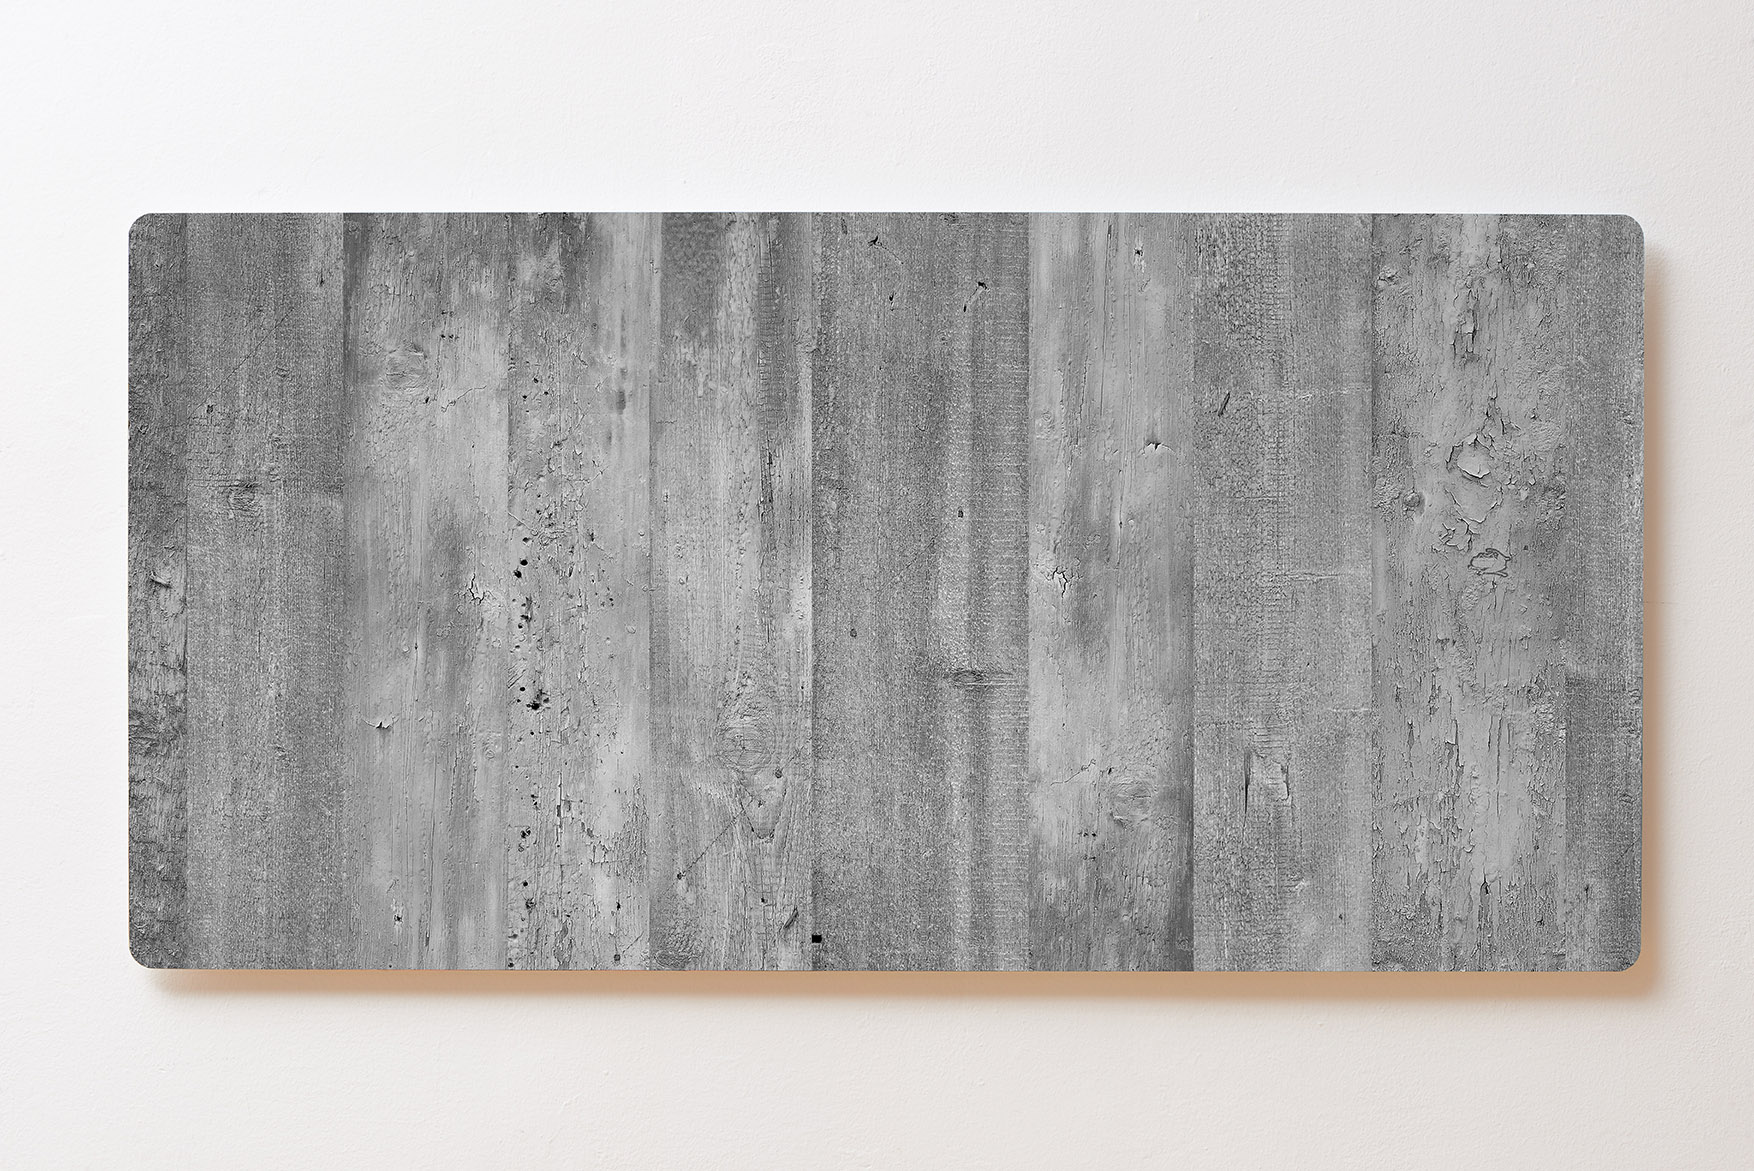 Magnettafel BACKLIGHT 120x60cm Motiv-Wandbild M127 Beton Betonwand